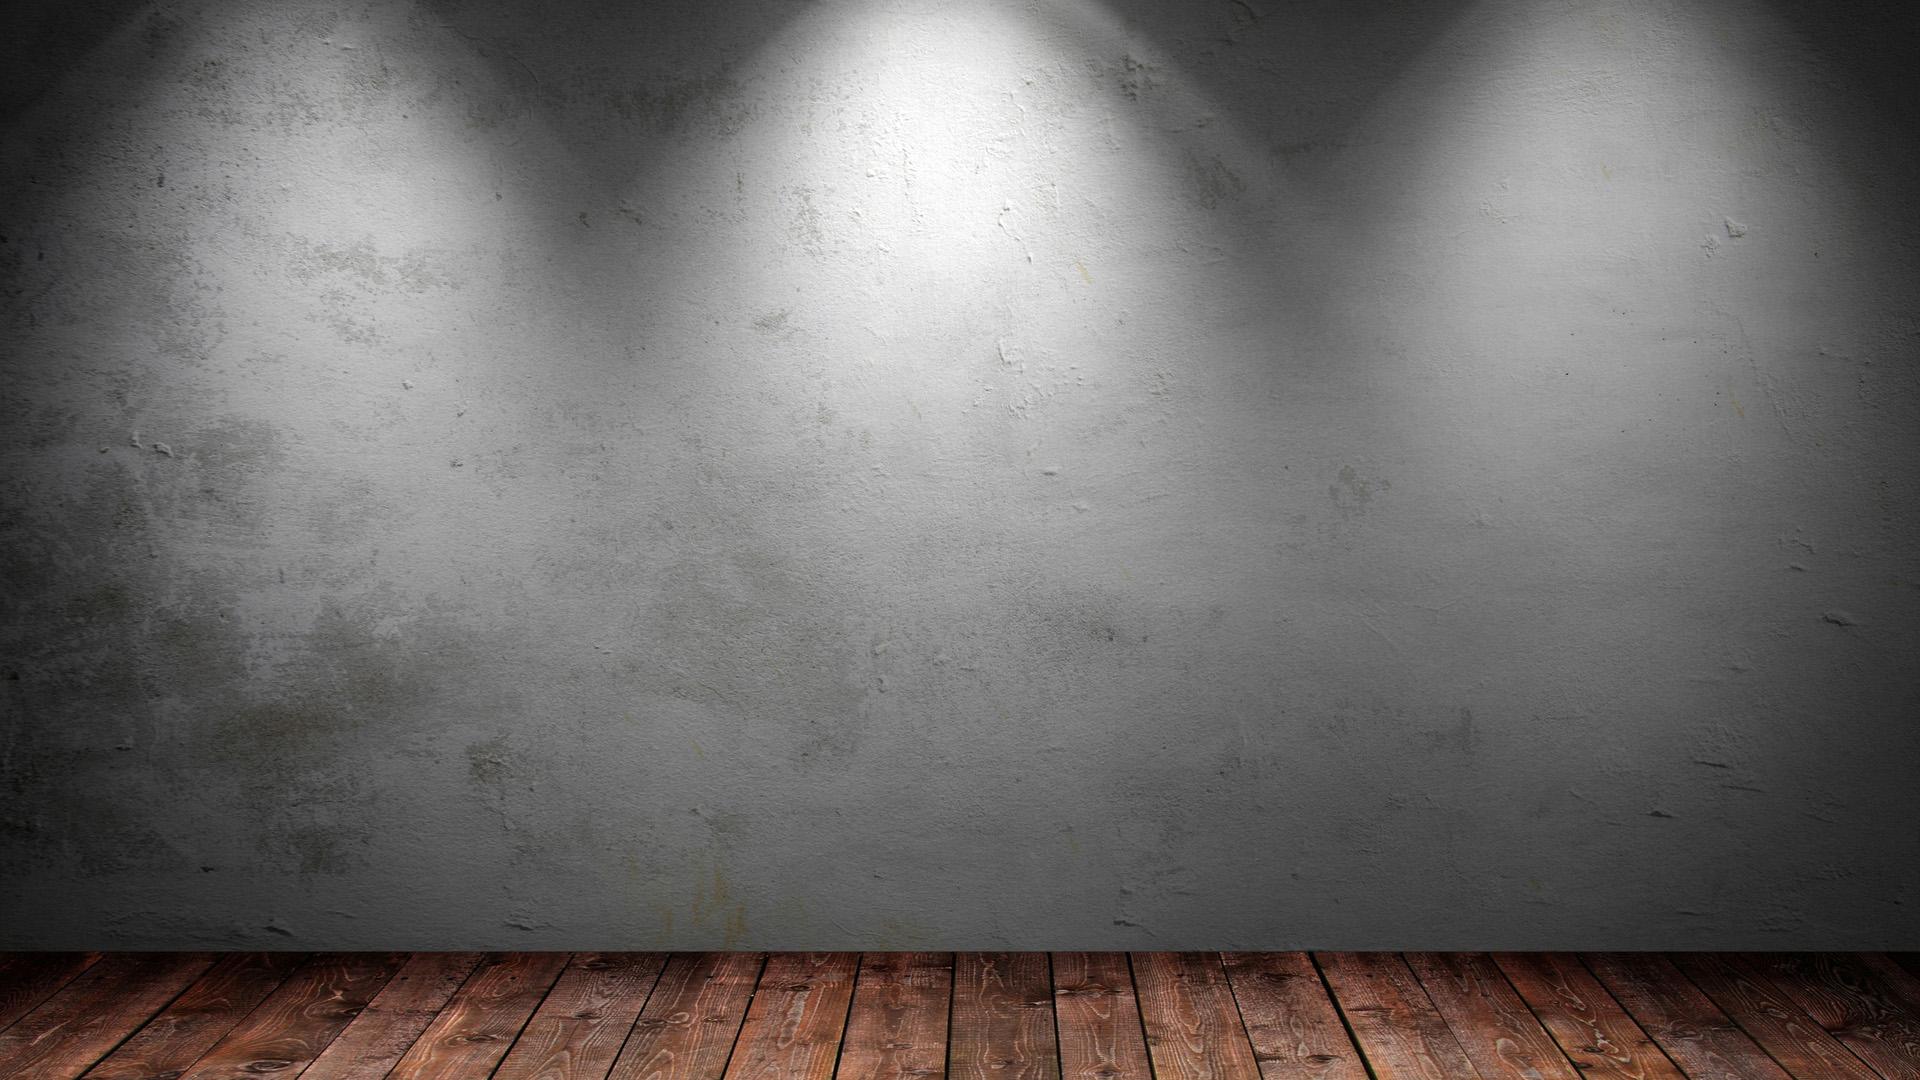 Free Download Empty Room Hd Wallpaper Fullhdwpp Full Hd Wallpapers